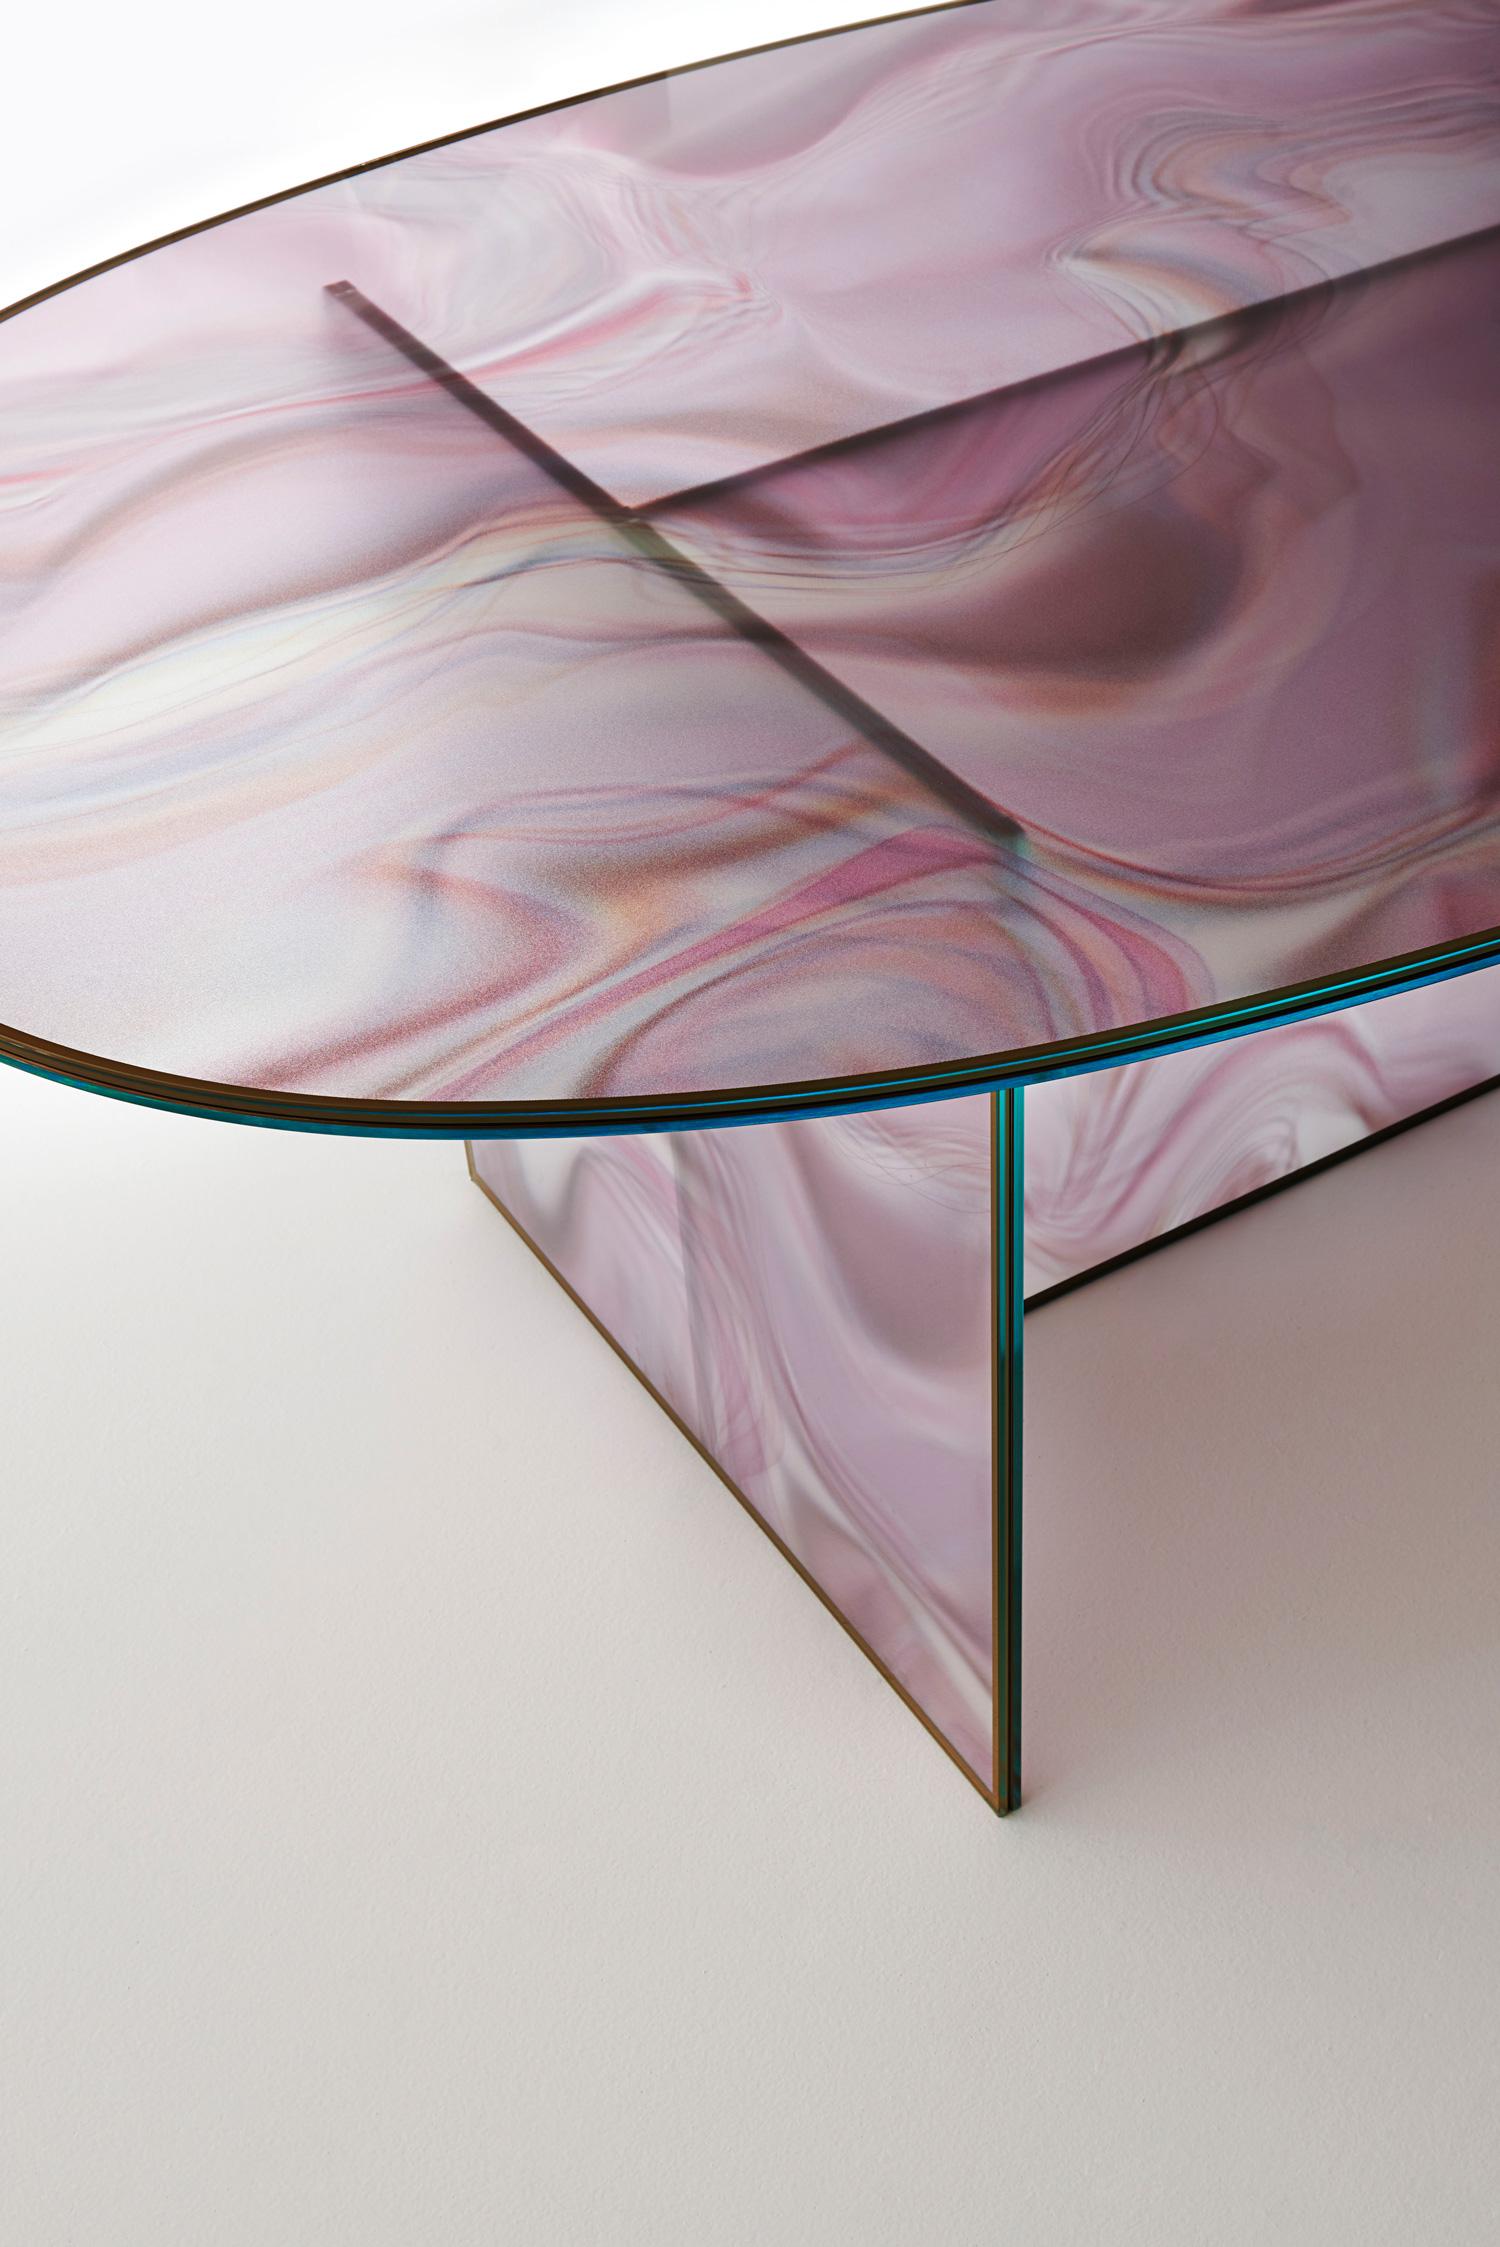 Liquefy by Patricia Urquiola for Glass Italia at Salone del Mobile 2017 | Yellowtrace